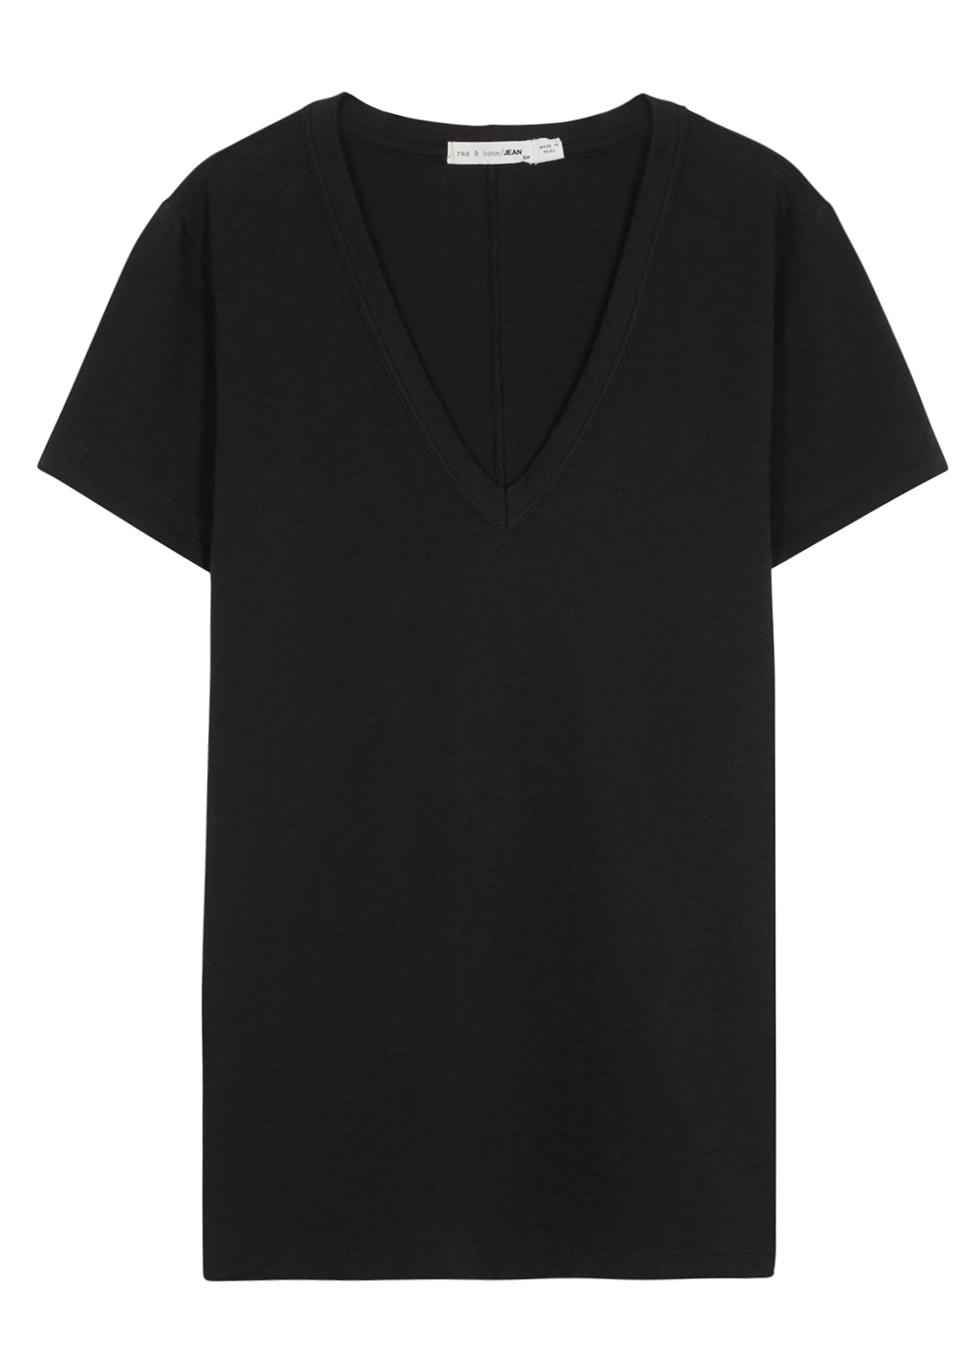 The Vee black cotton T-shirt - rag & bone